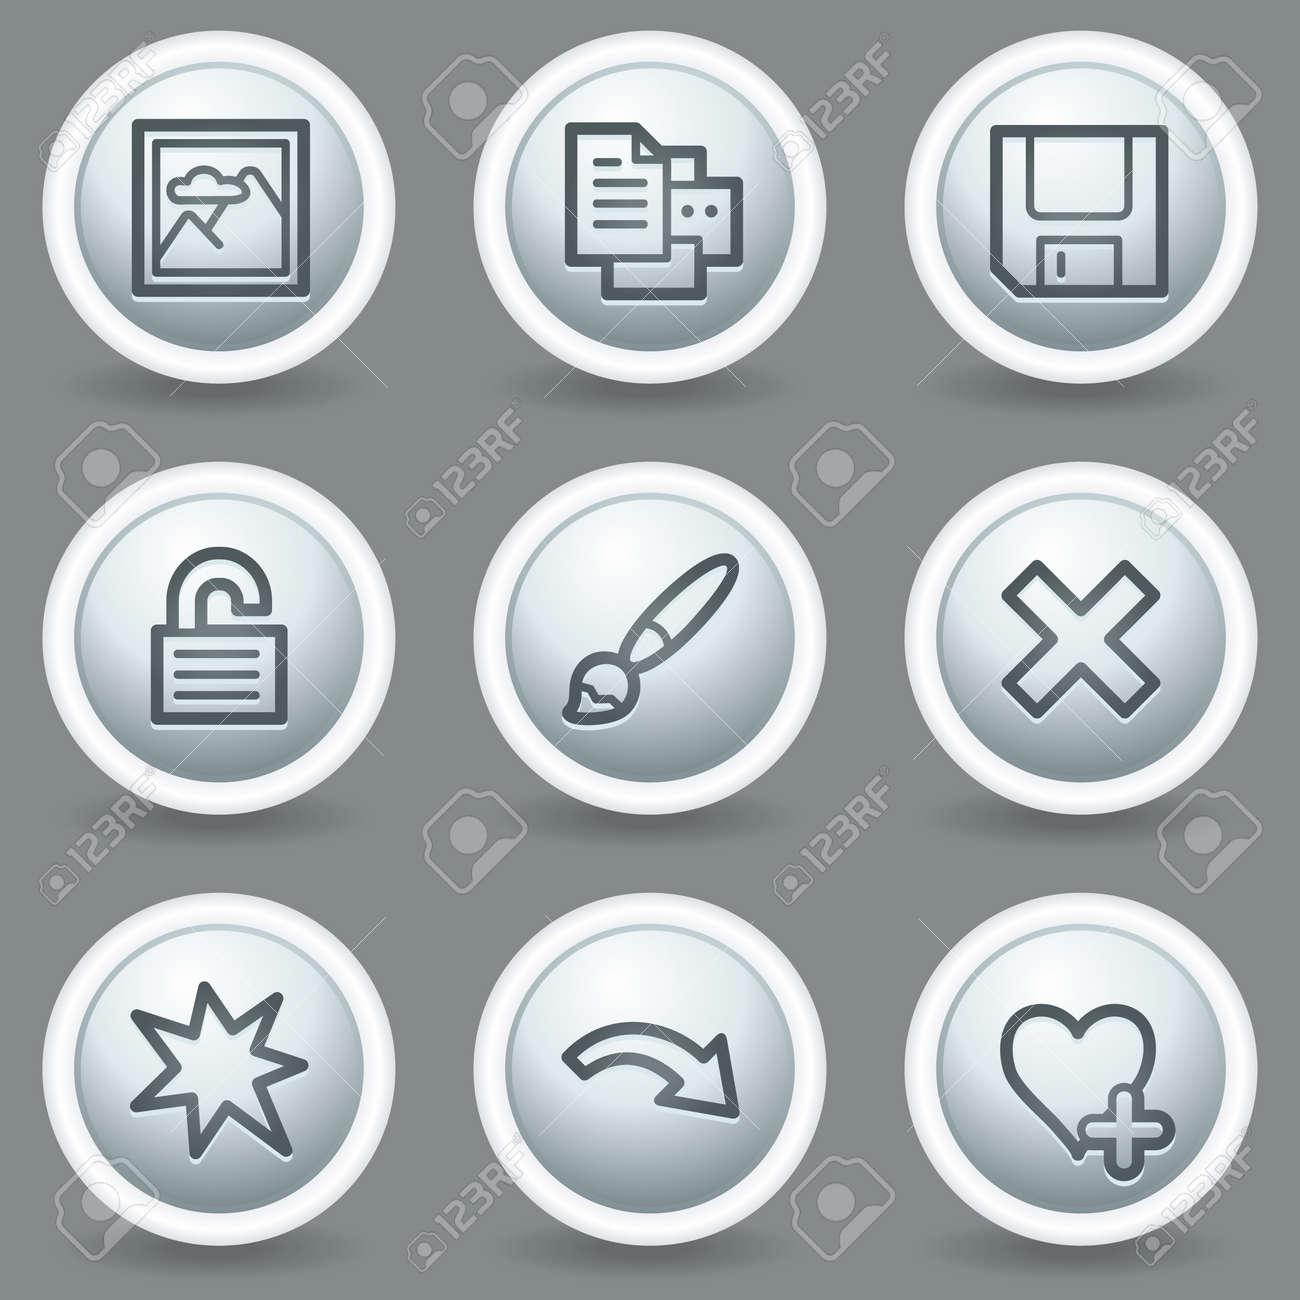 Image viewer web icons set 2, circle grey matt buttons Stock Vector - 23014402